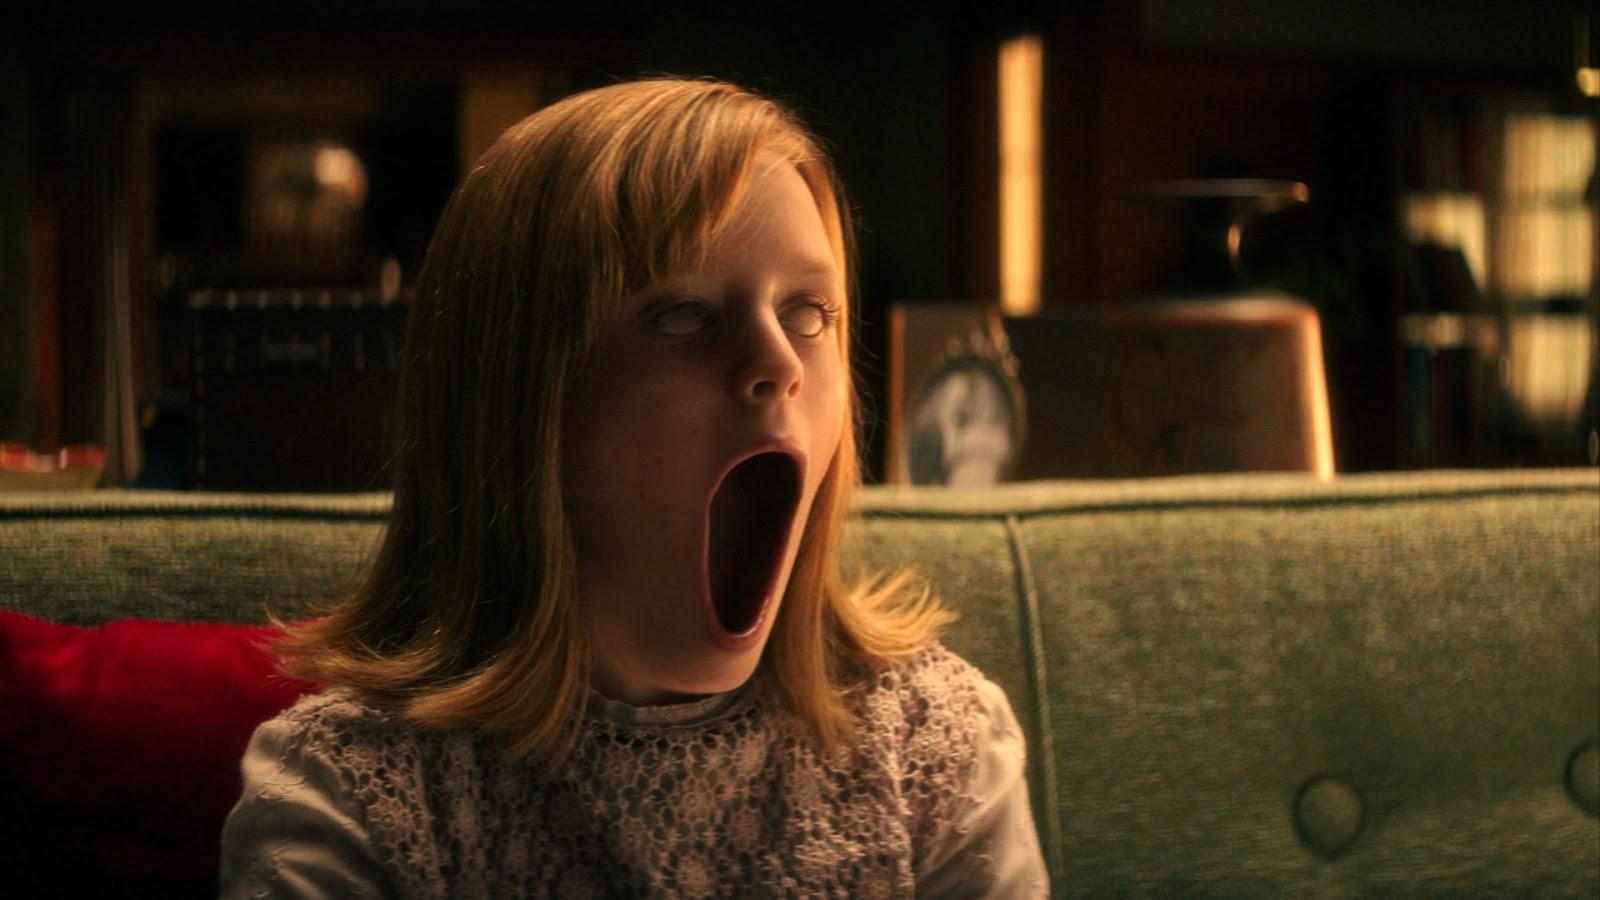 Ouija – Origem do Mal | Confira vídeo inédito e pôster do terror sobrenatural